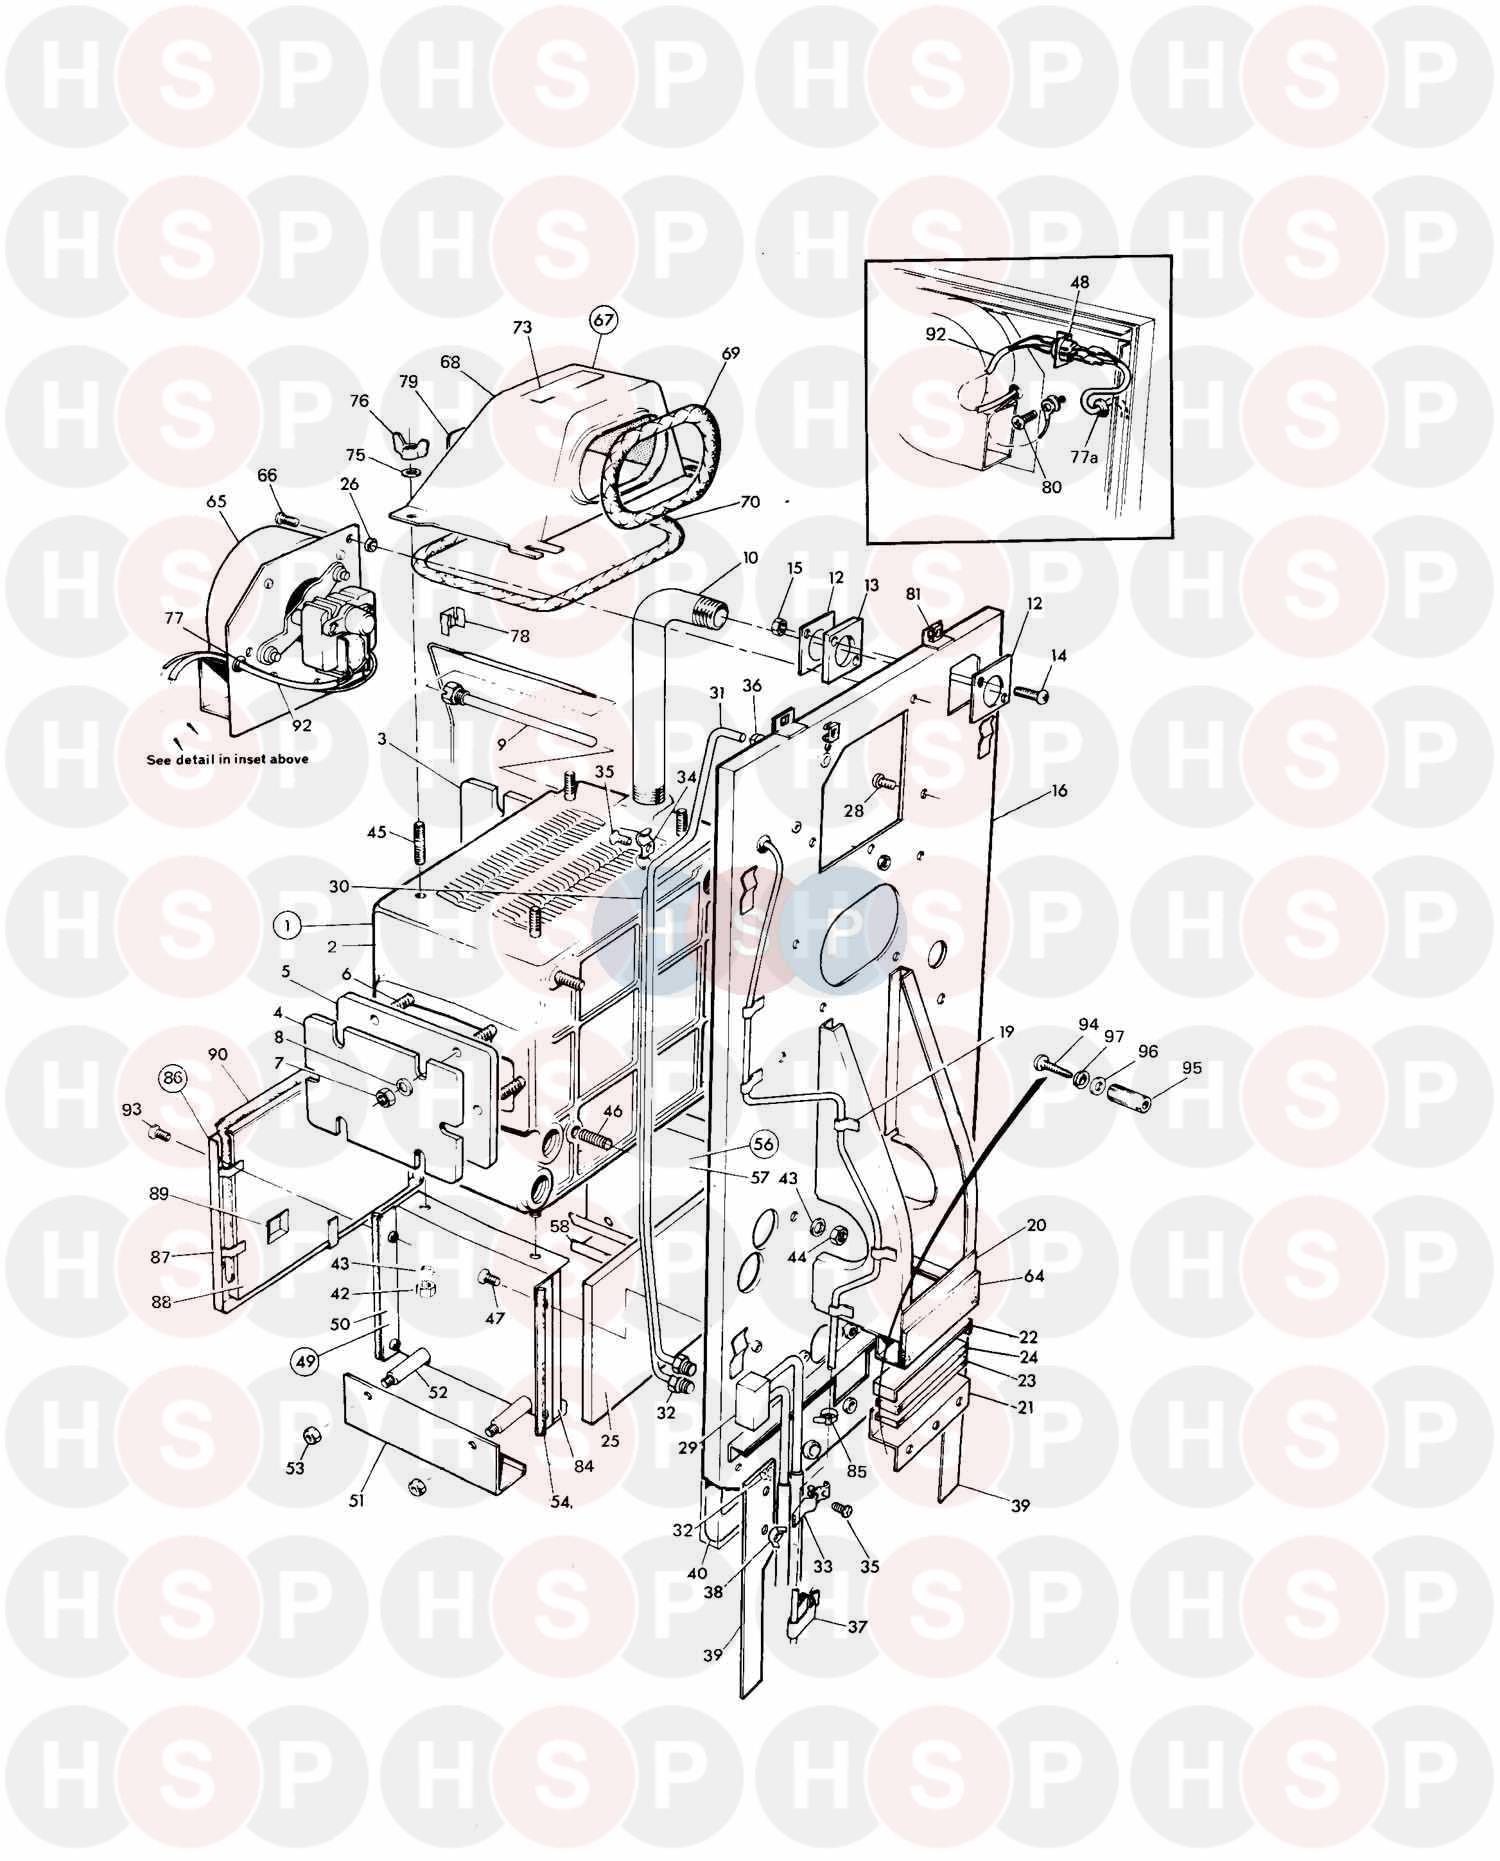 Potterton NETAHEAT MK 2 10/16 (ASSEMBLY 2) Diagram